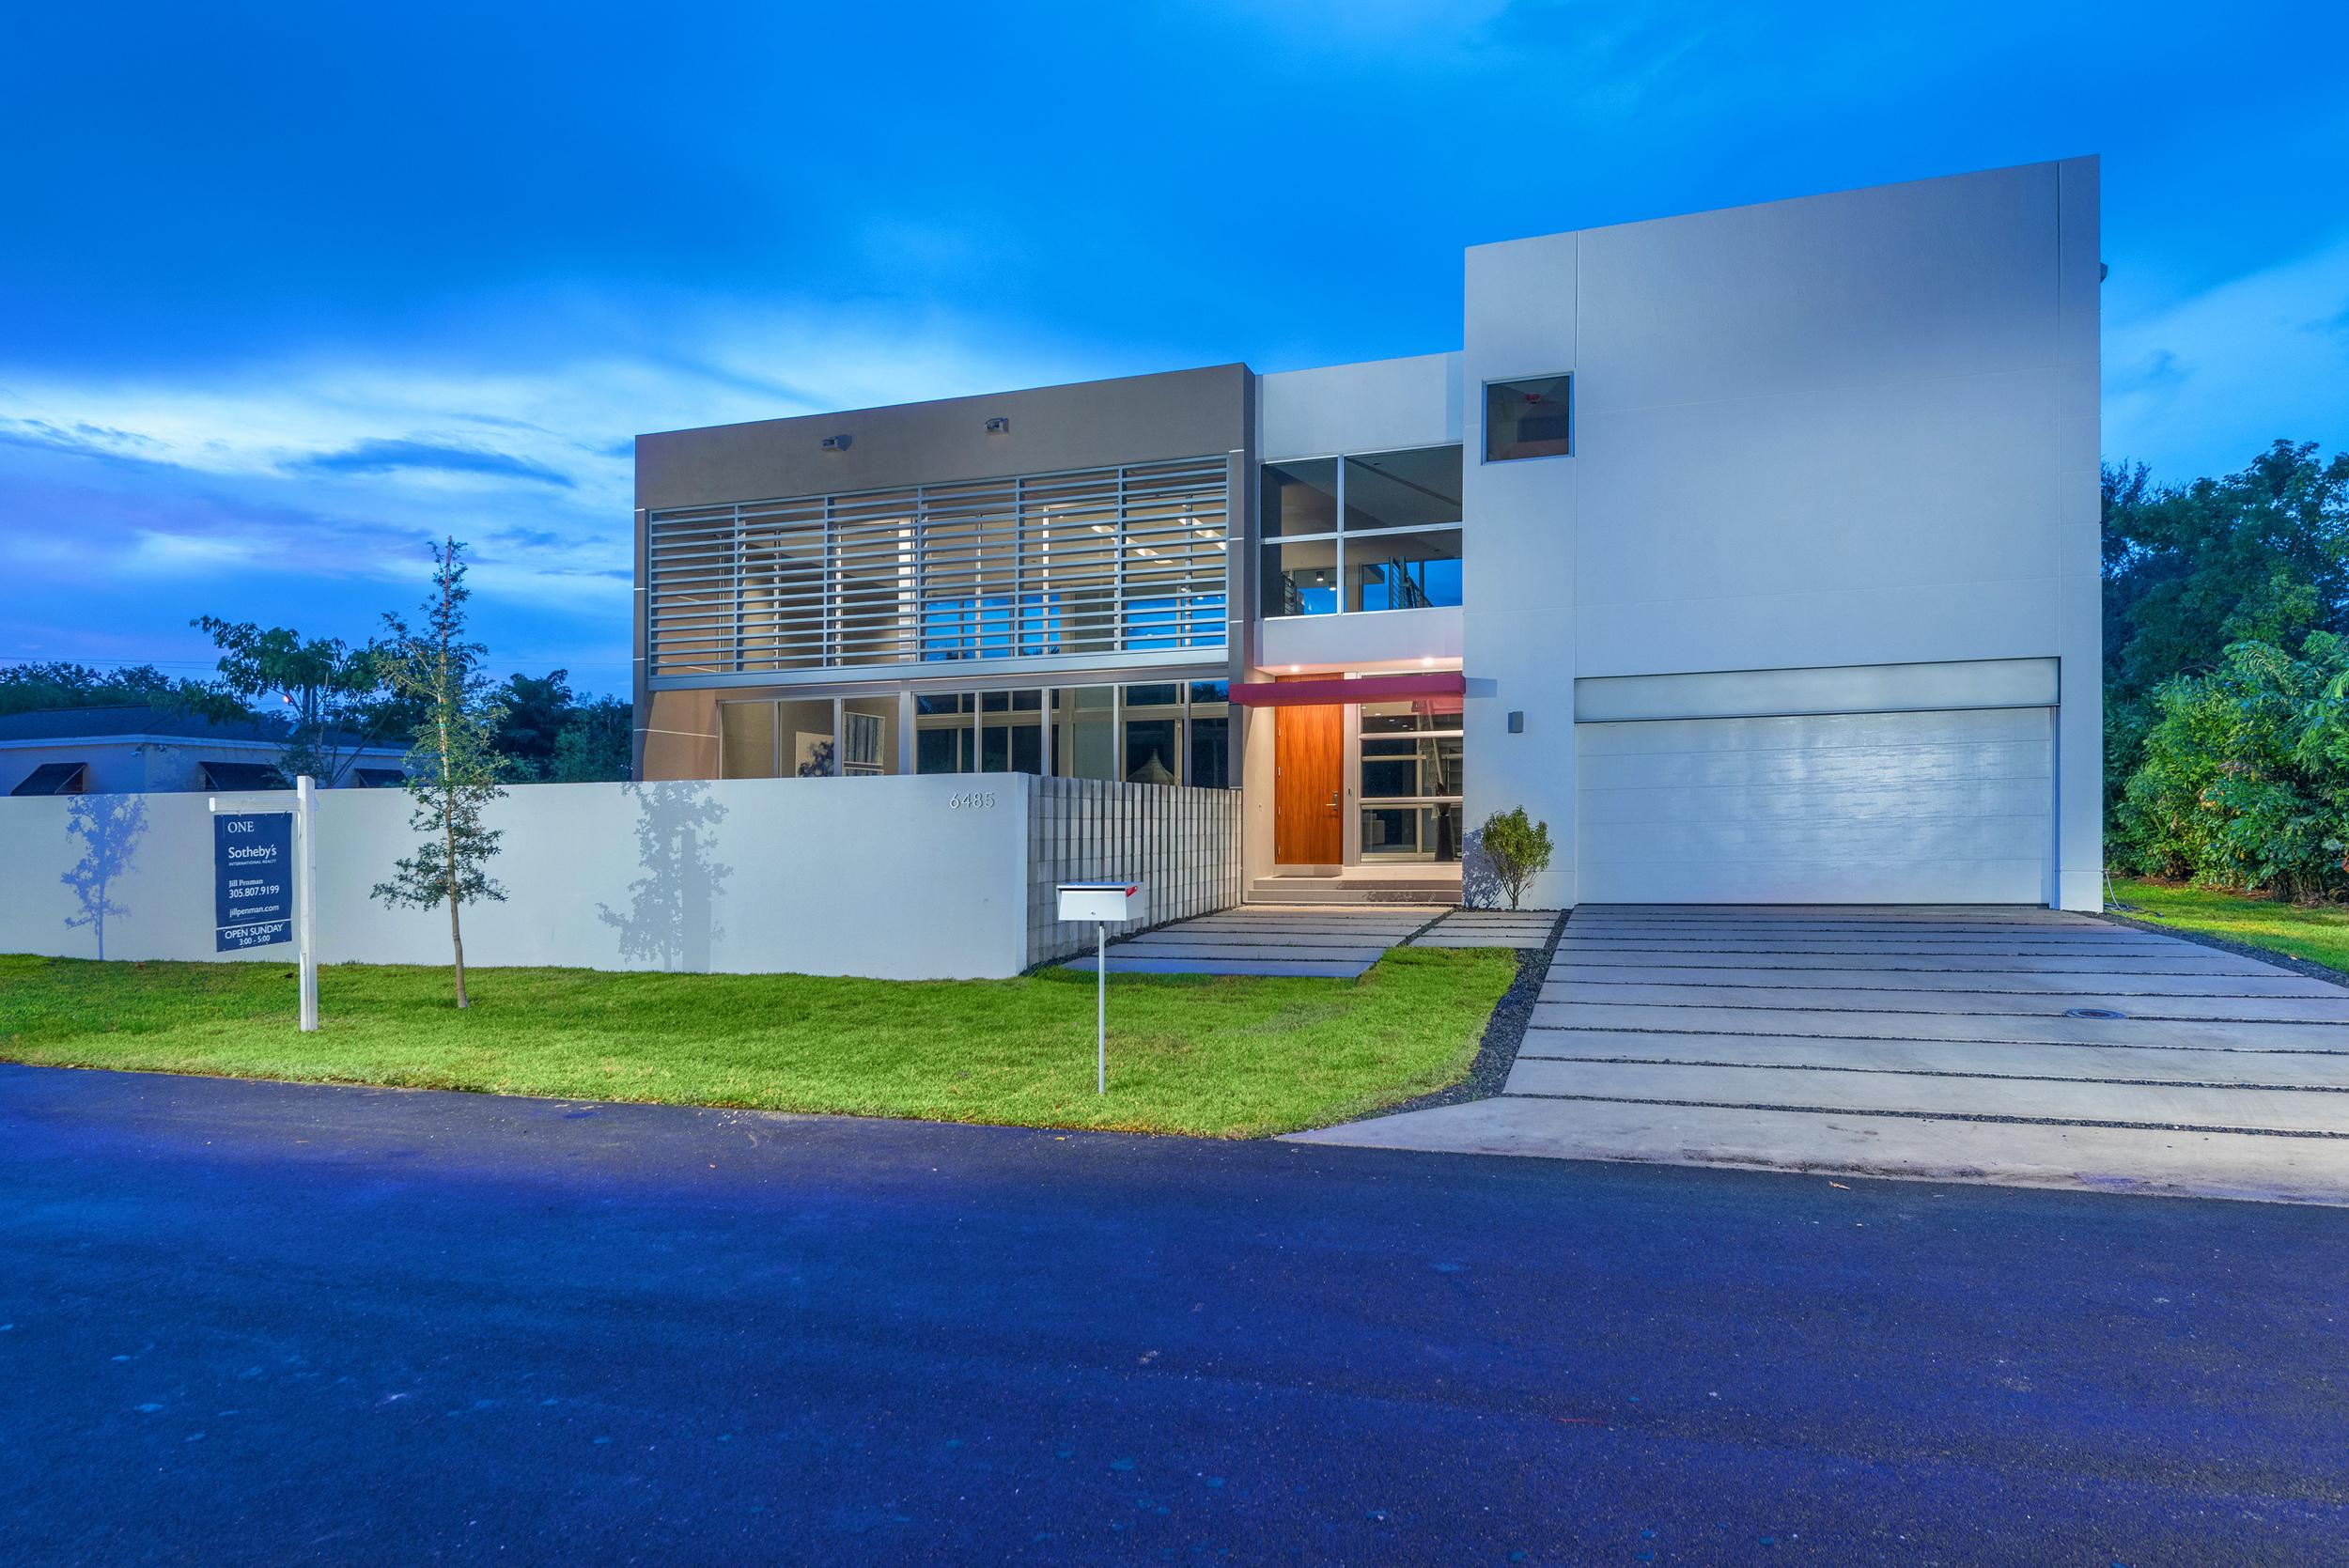 The Setting Homes Plum House Miami Florida Exterior Night TARIS Real Estate